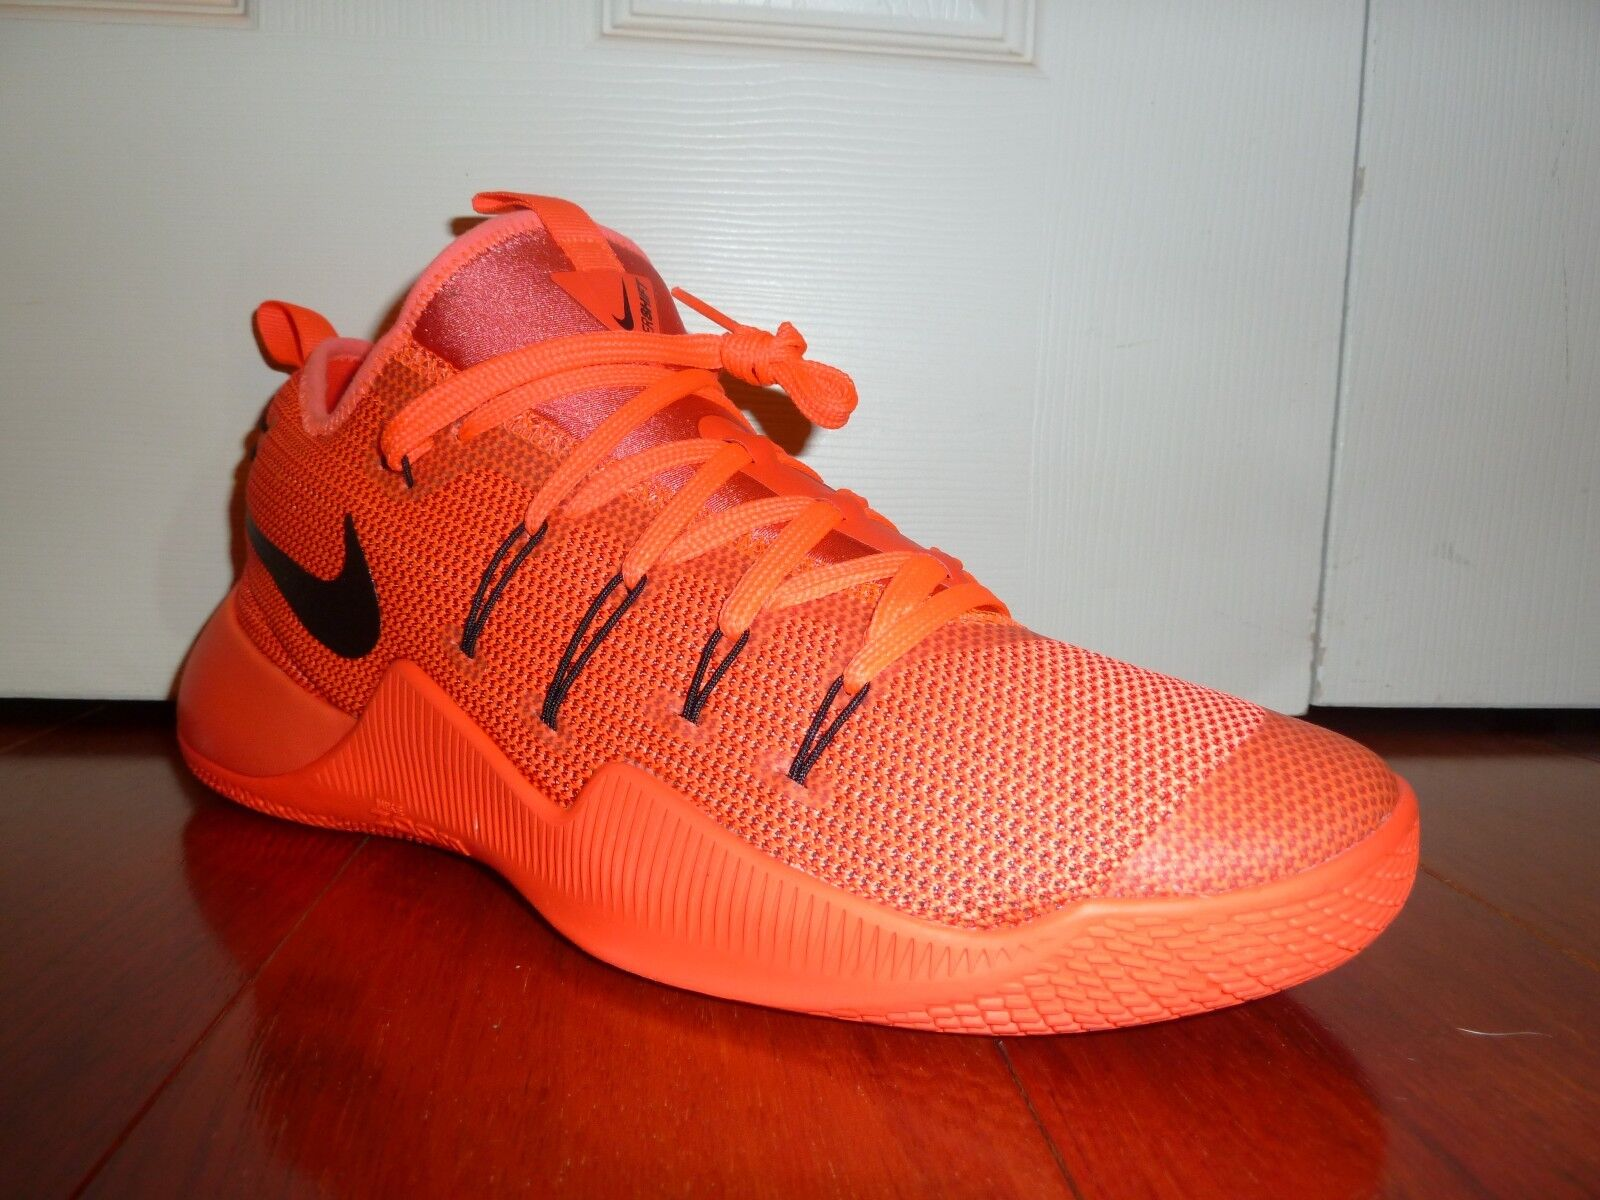 New Nike Hypershift Men's Basketball Shoes University Red Black 844369 607 Price reduction